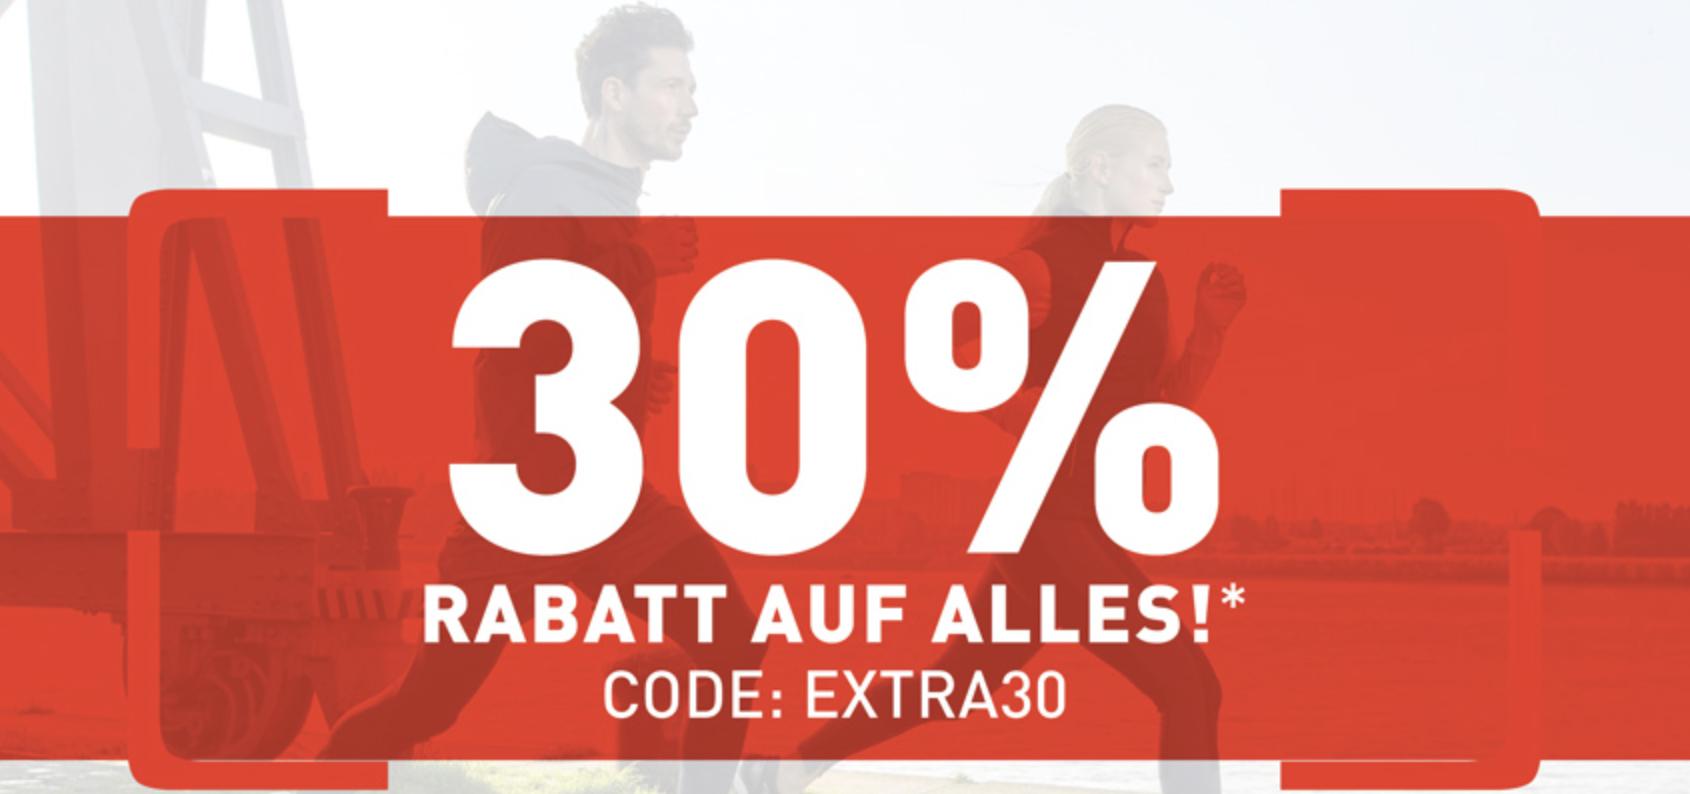 Runnerspoint: 30% Rabatt auf ALLES inklusive Sale